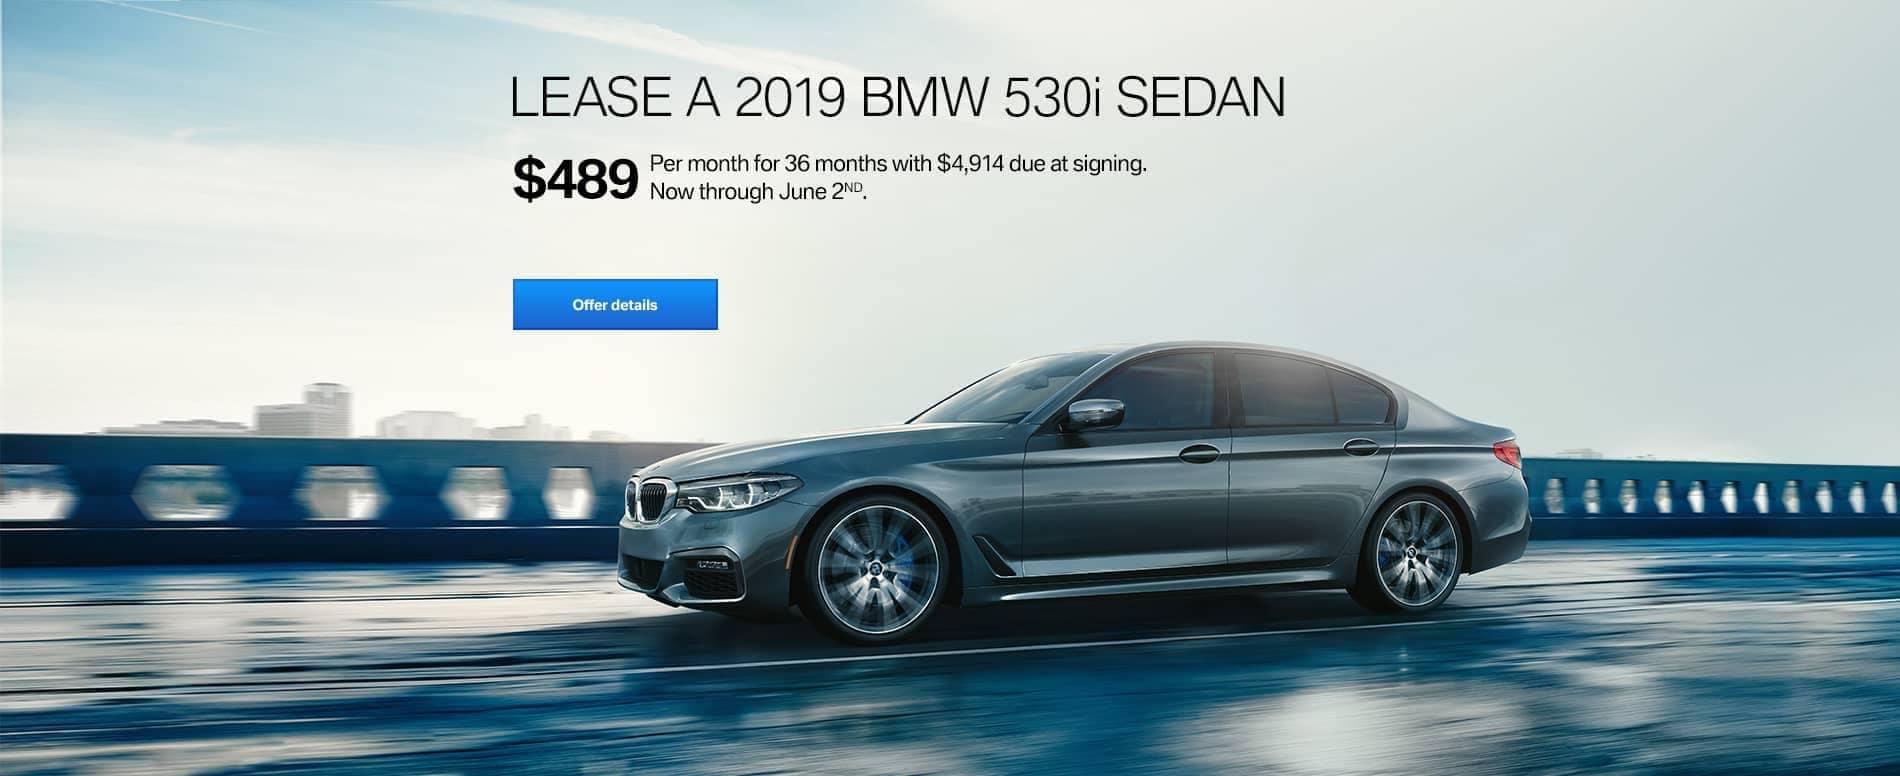 PUSH_2019_BMW_530i_Sedan_489-2